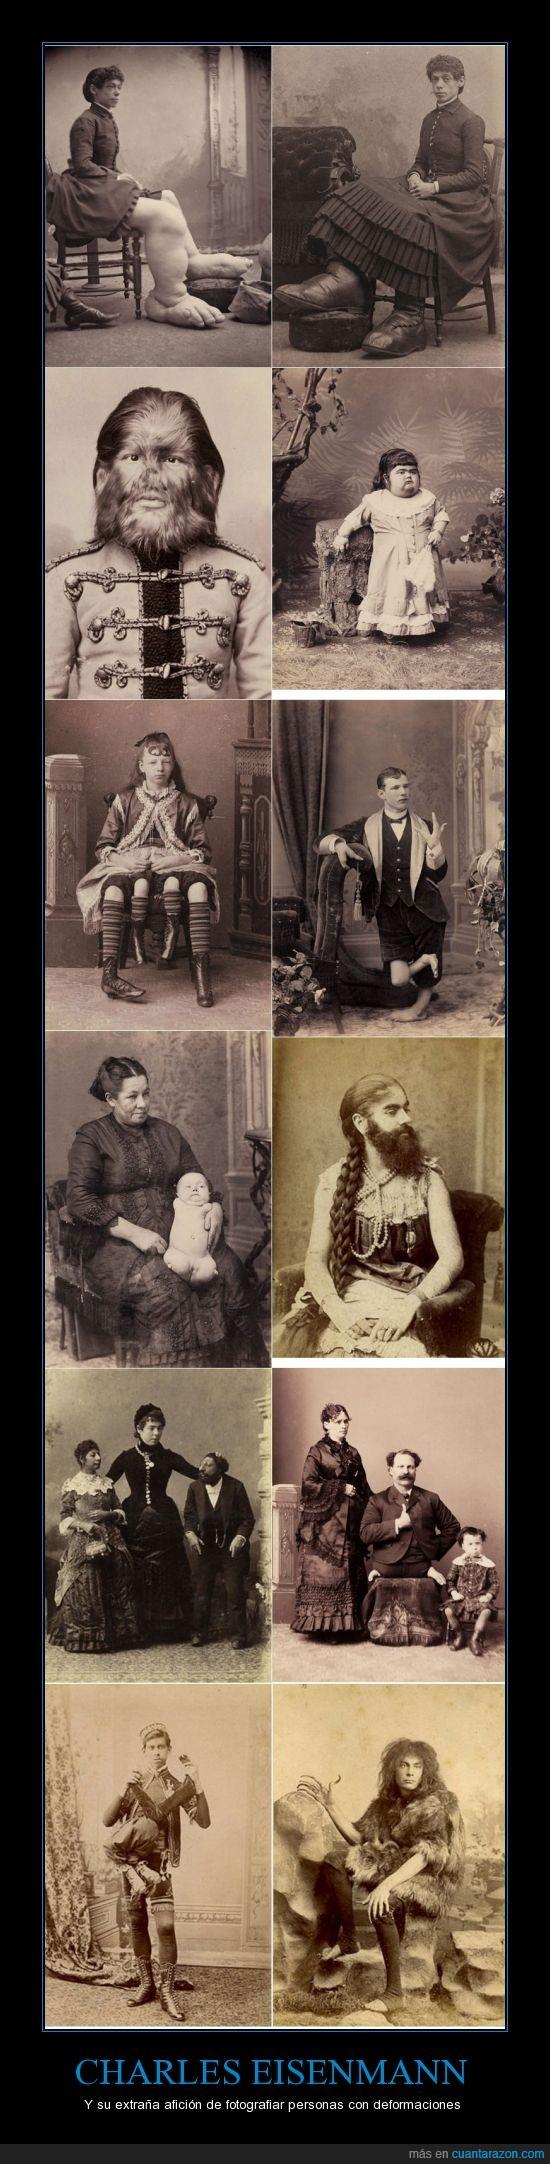 barba,circo,fotografia,freaks,mano,mujer,perna